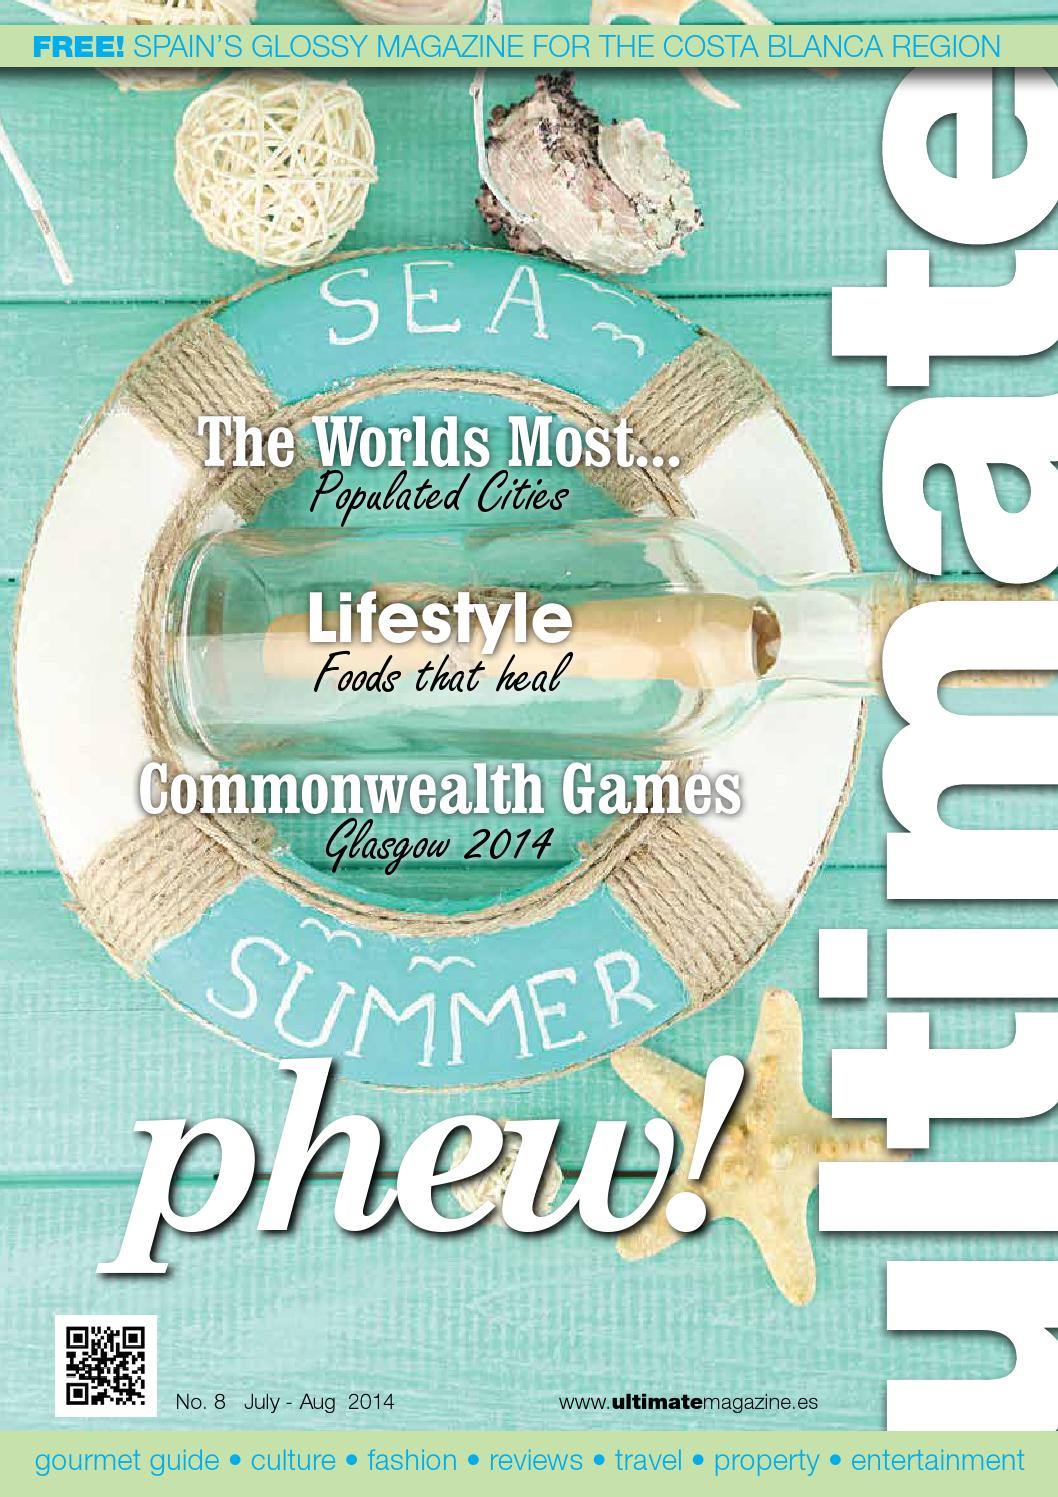 Ultimate Magazine Costa Blanca Jul Aug 14 By Almeria Issuu Punjabi Punch 250gr